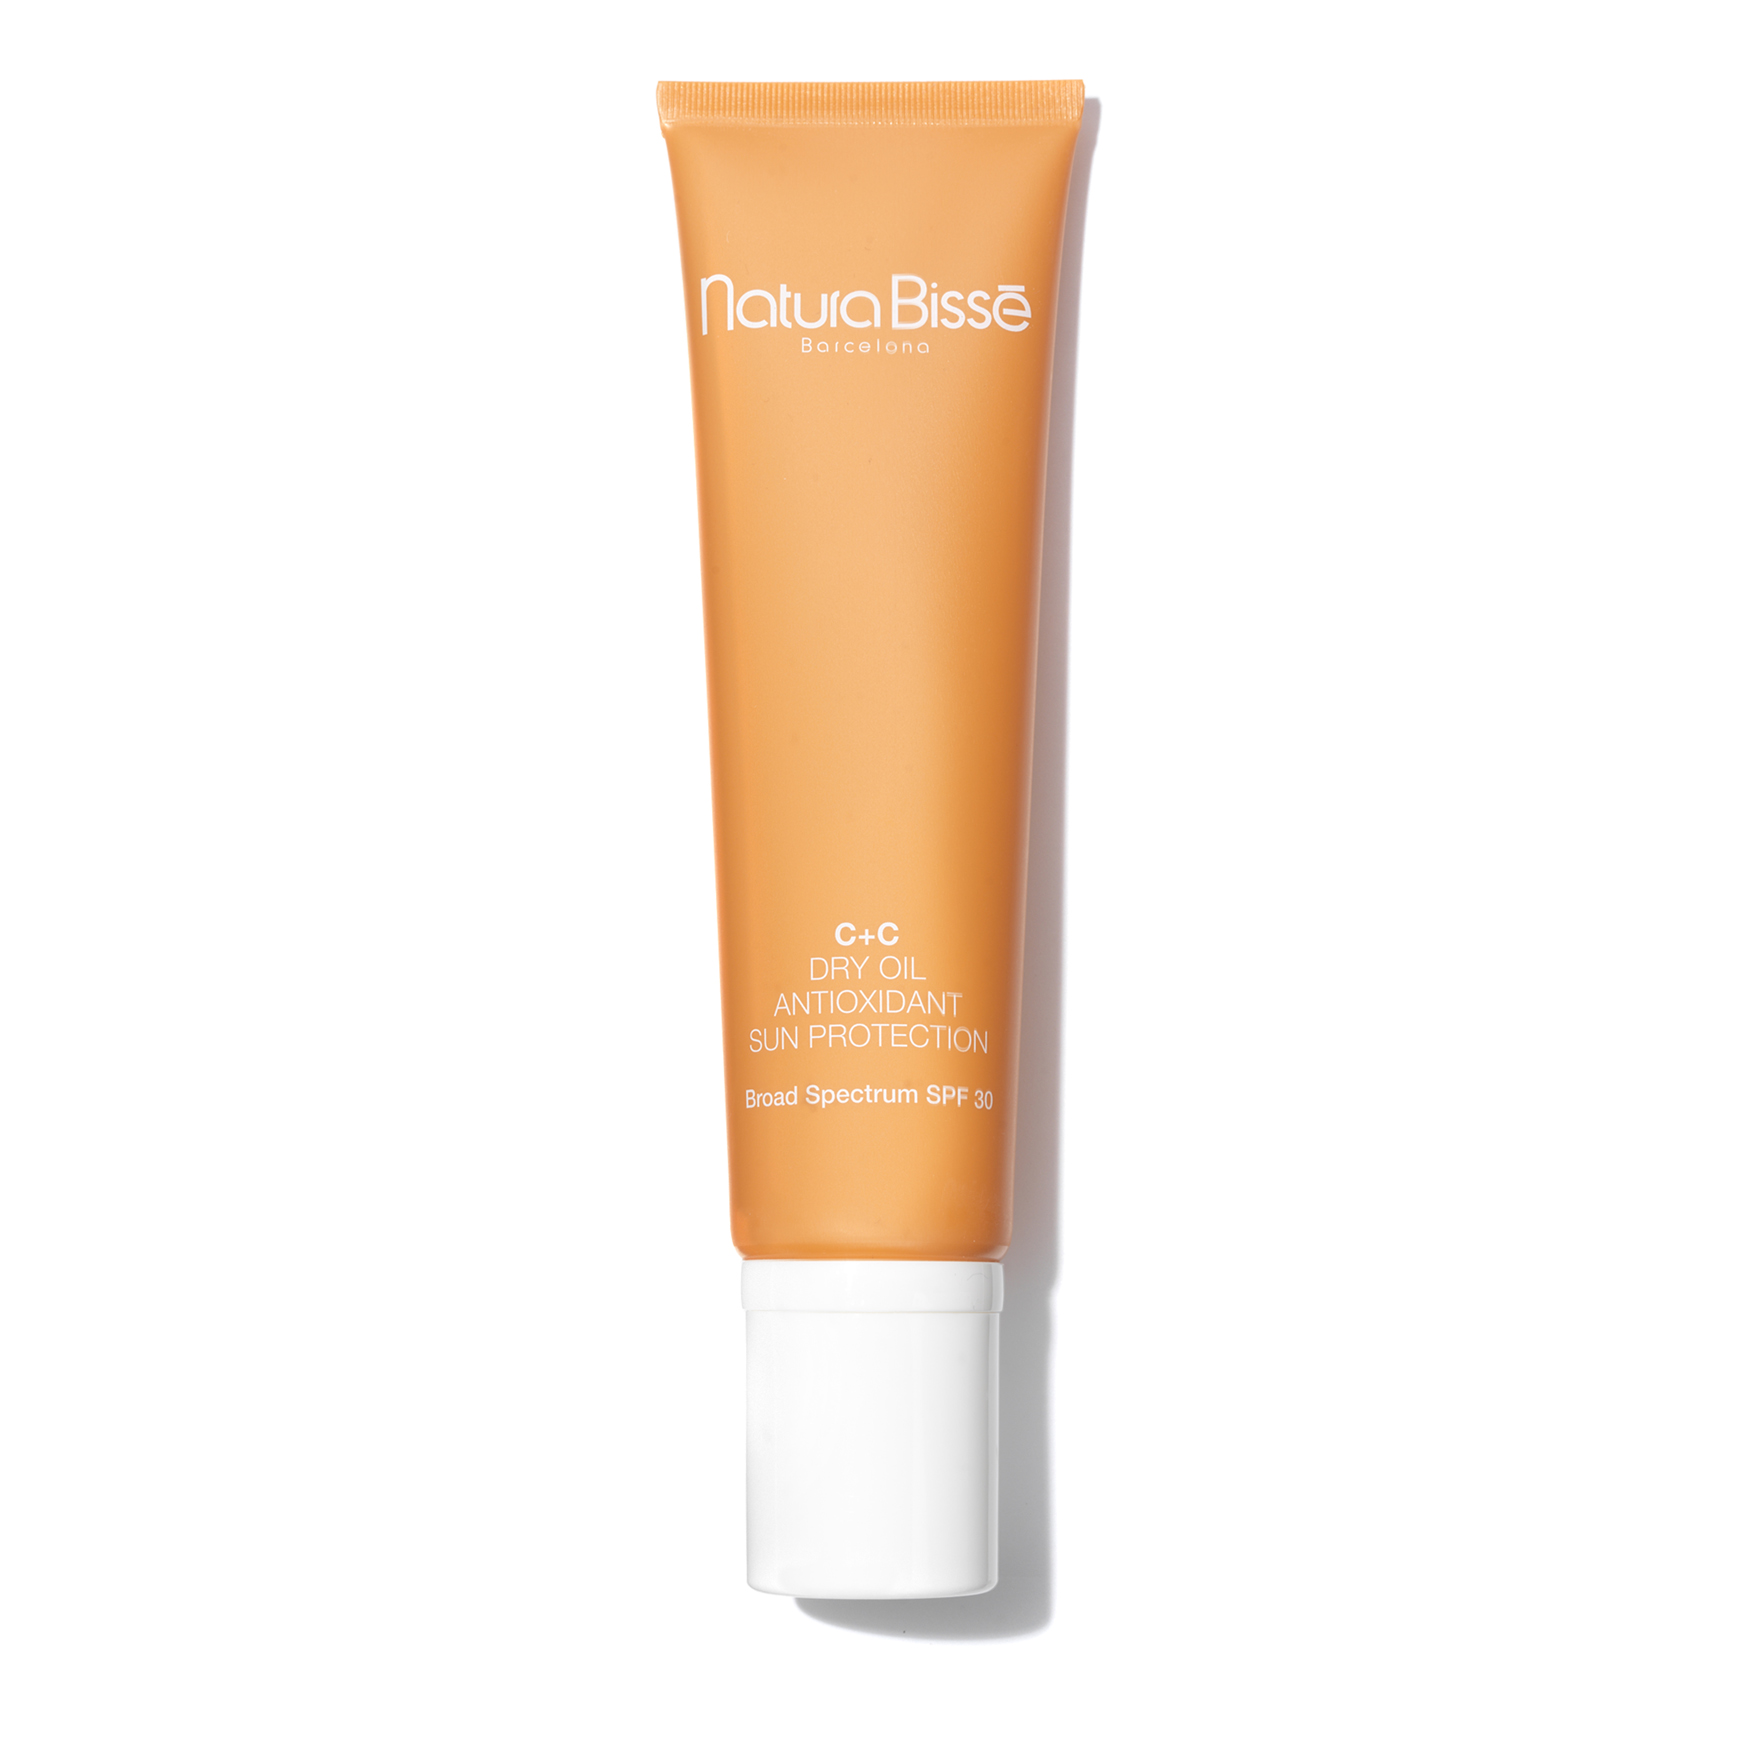 C+C SPF30 Dry Oil Antioxidant Sun Protection, , large